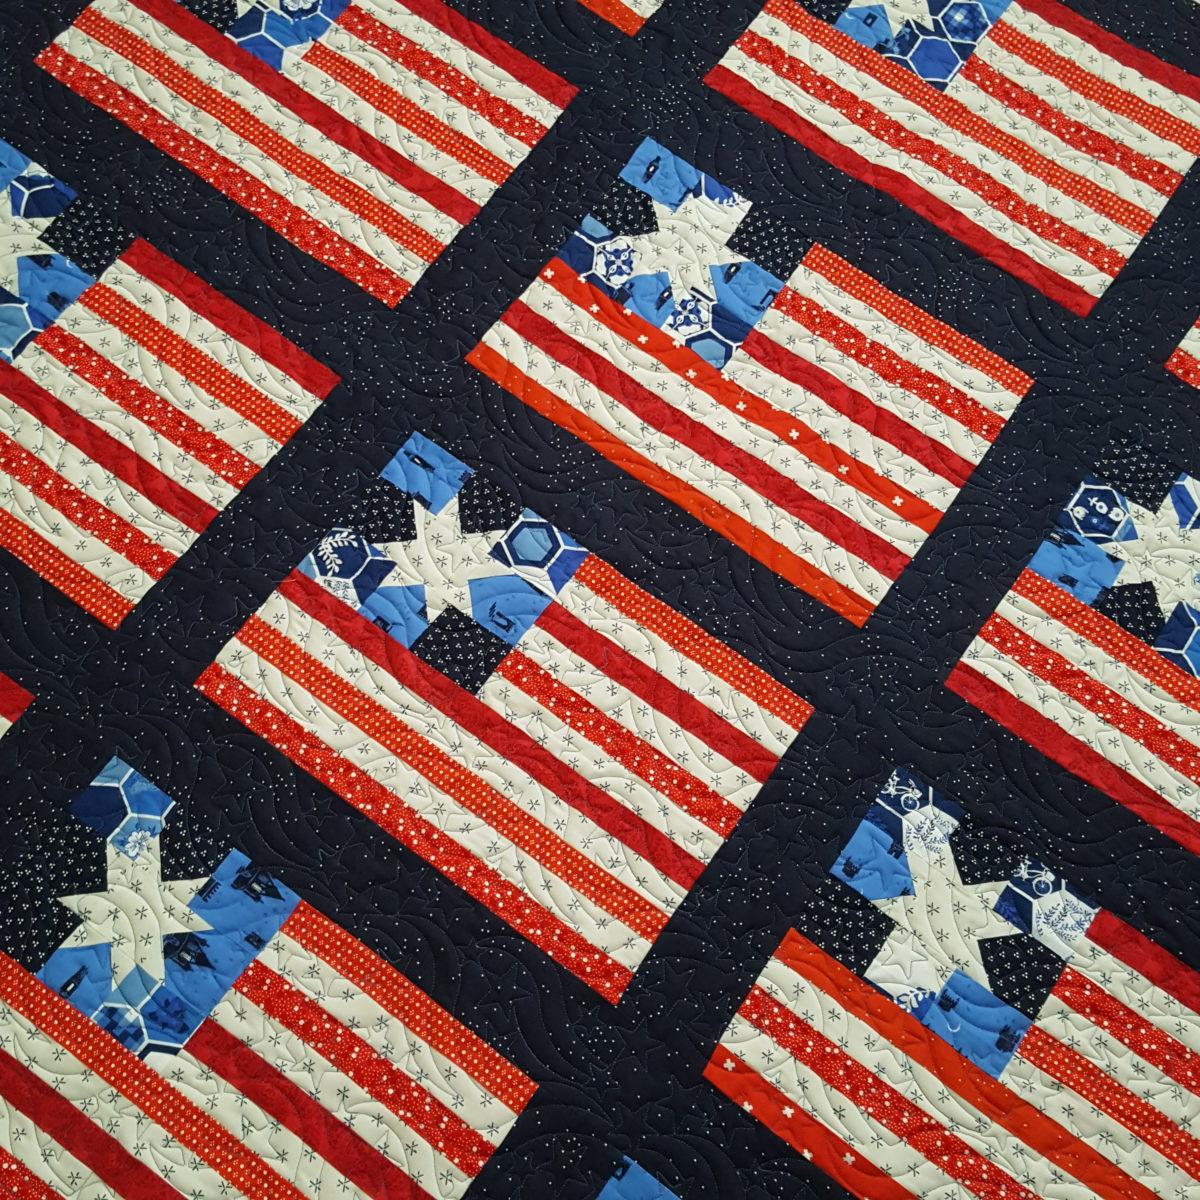 Sara's Flag Quilt